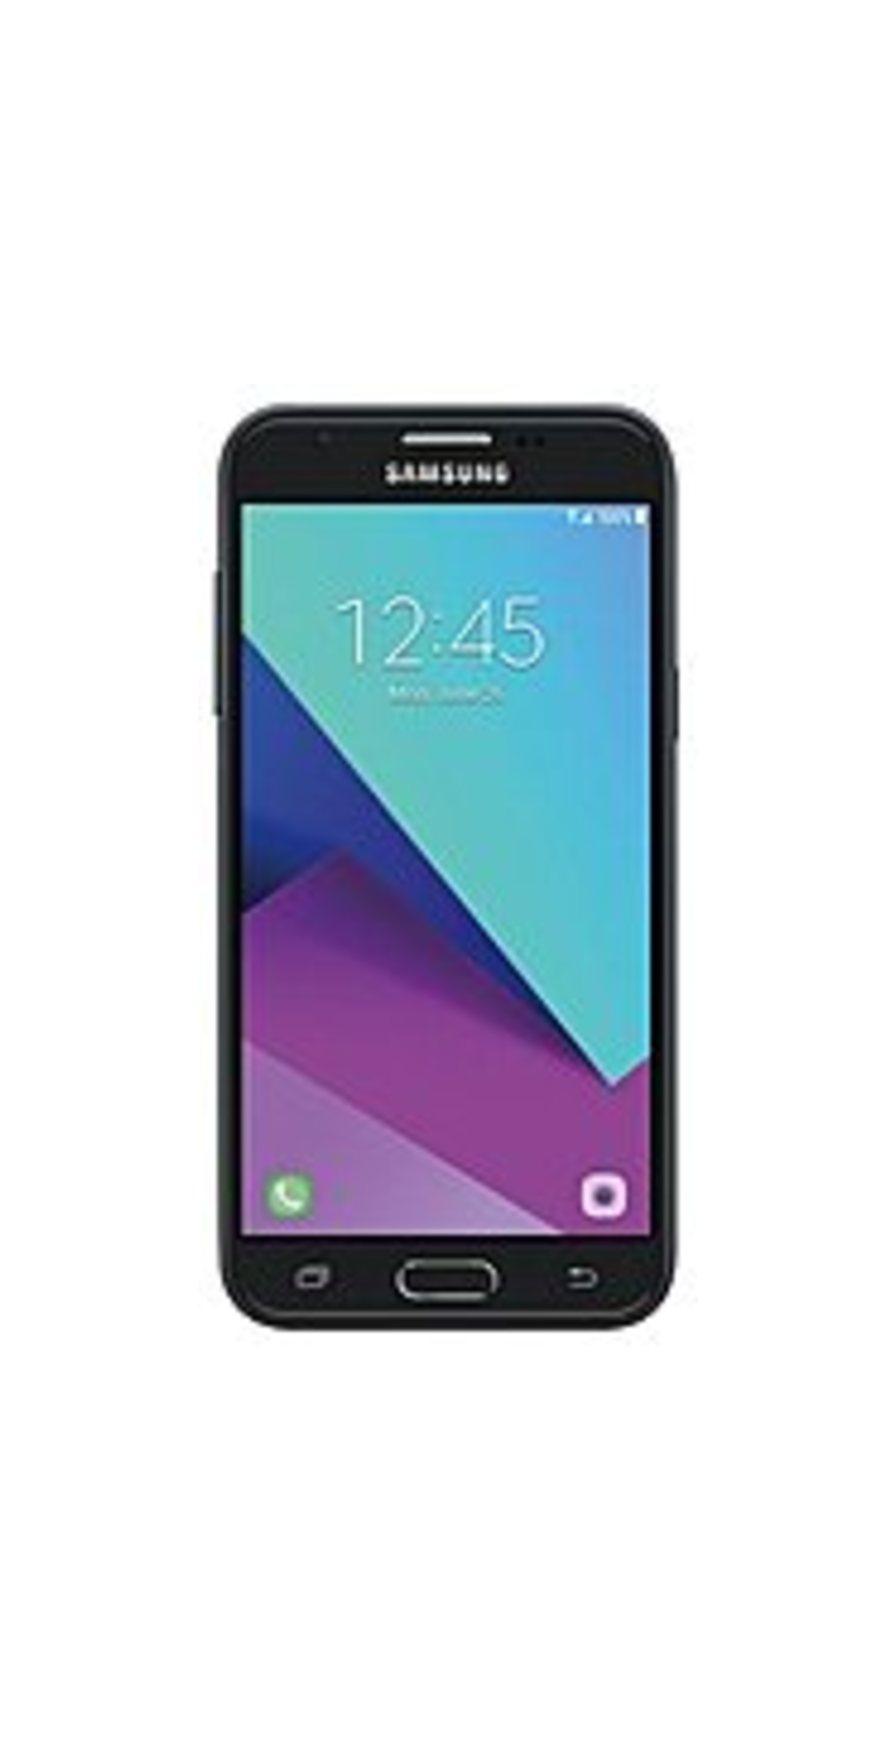 Samsung Galaxy J3 (2017) SM-J327UZKAXAA SM-J327U Smartphone - GSM 850/900/1800/1900 MHz - Bluetooth 4.2 - 5.0-inch Display - 16 GB Storage Memory - Un